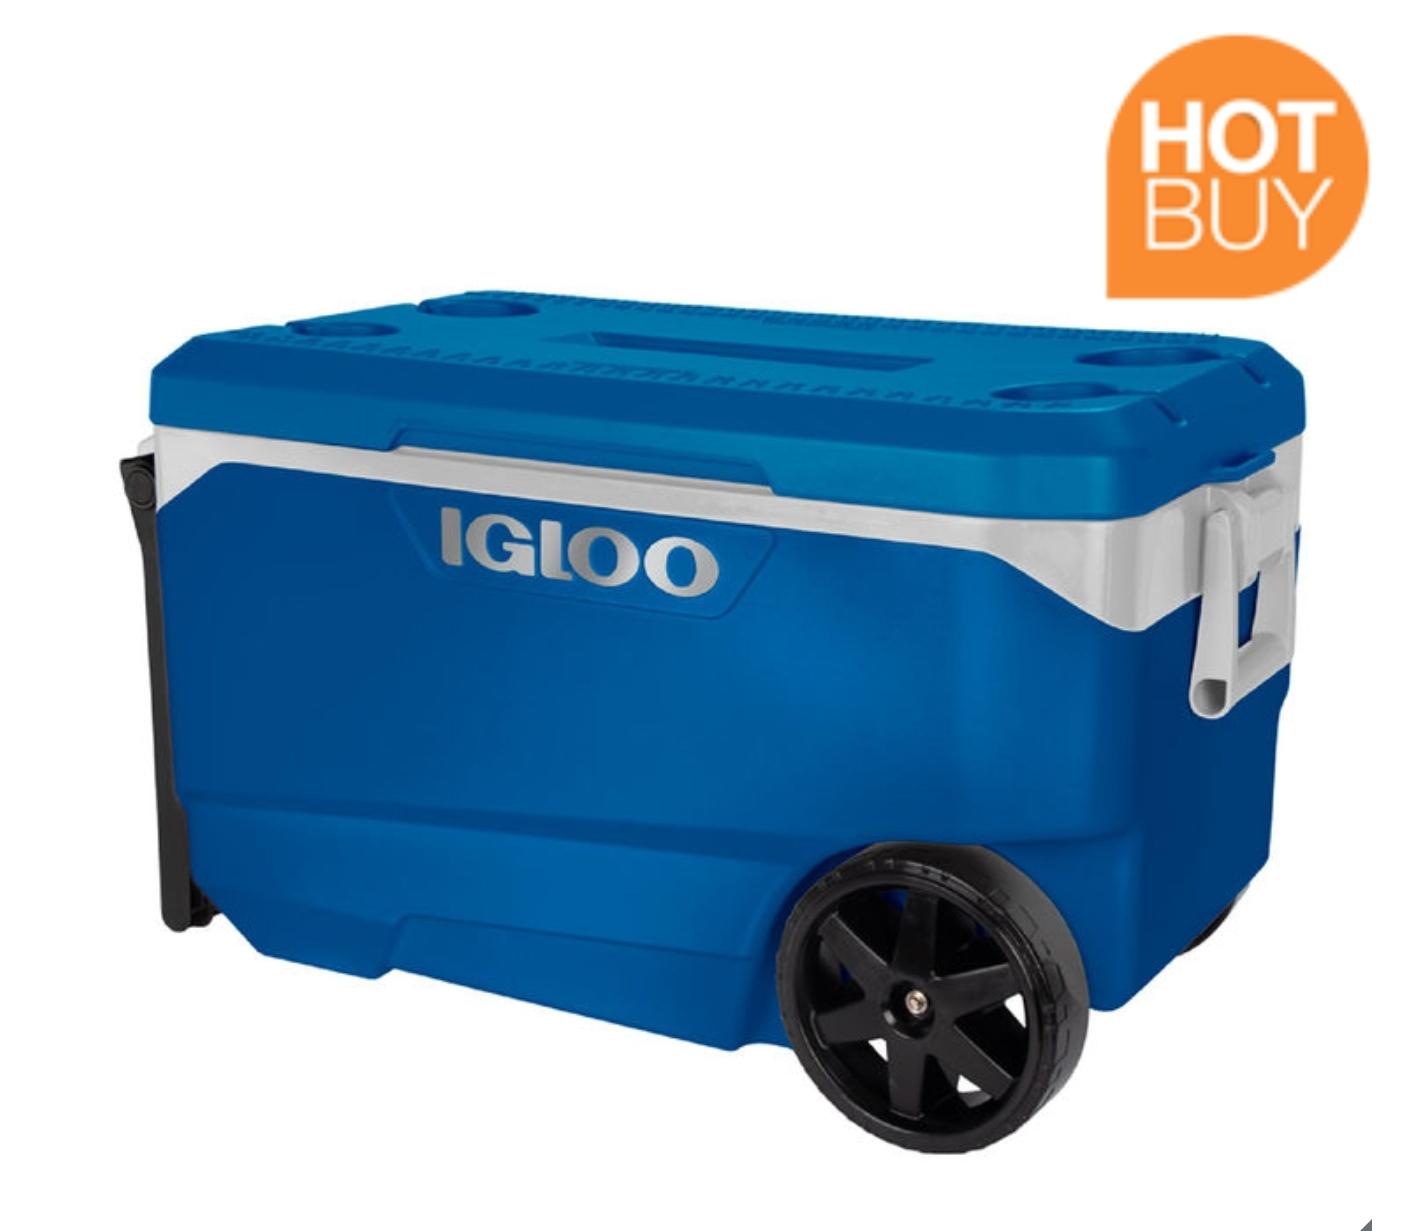 Igloo Flip and Tow 85 Litre (90 US Quart) Cool Box £59.89 @ Costco